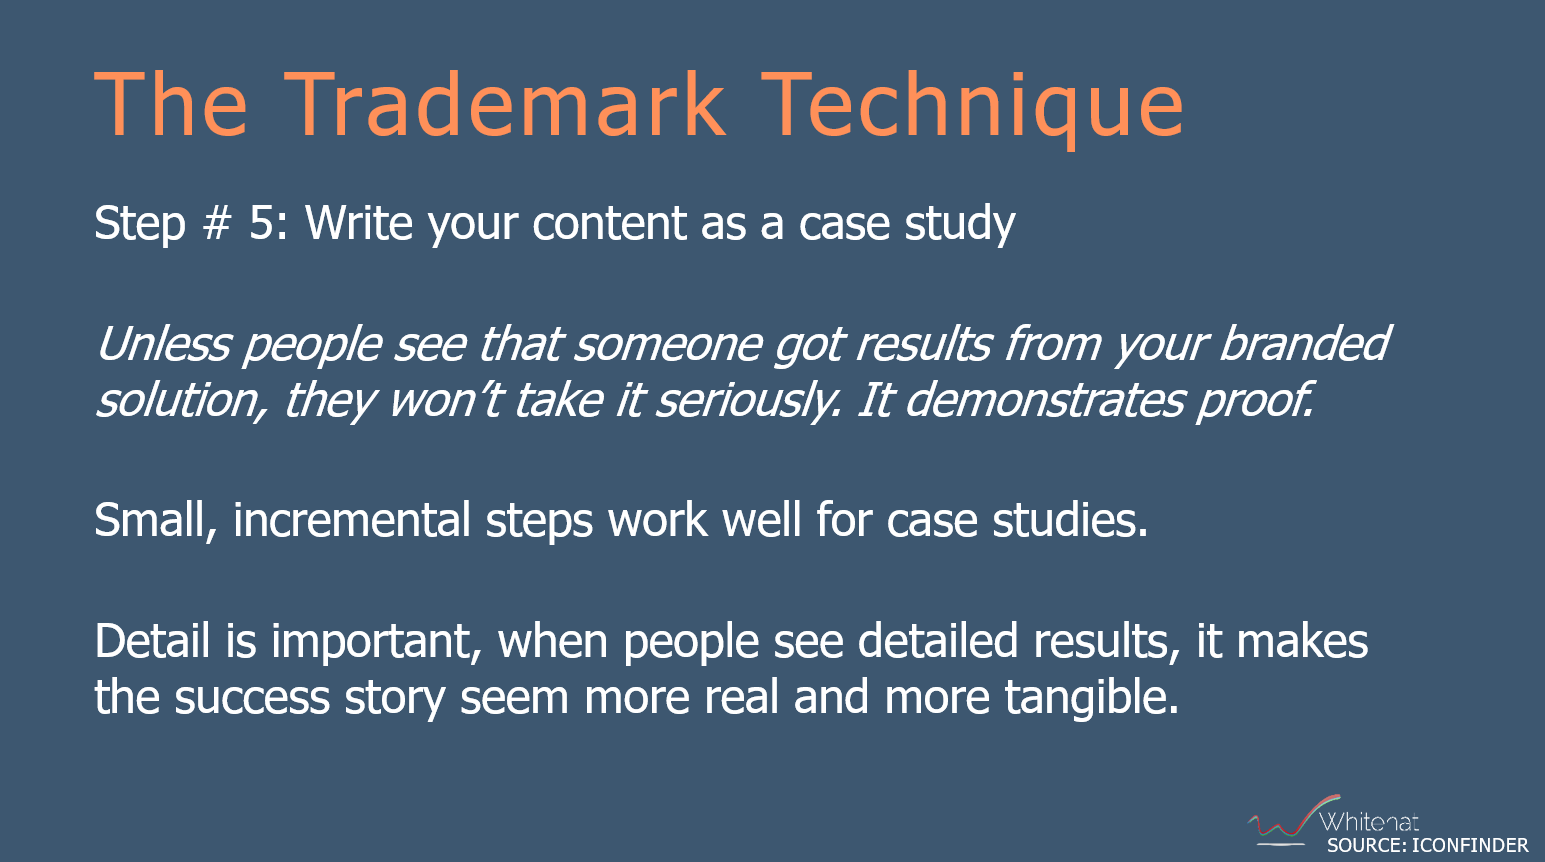 trademark-technique-case-study